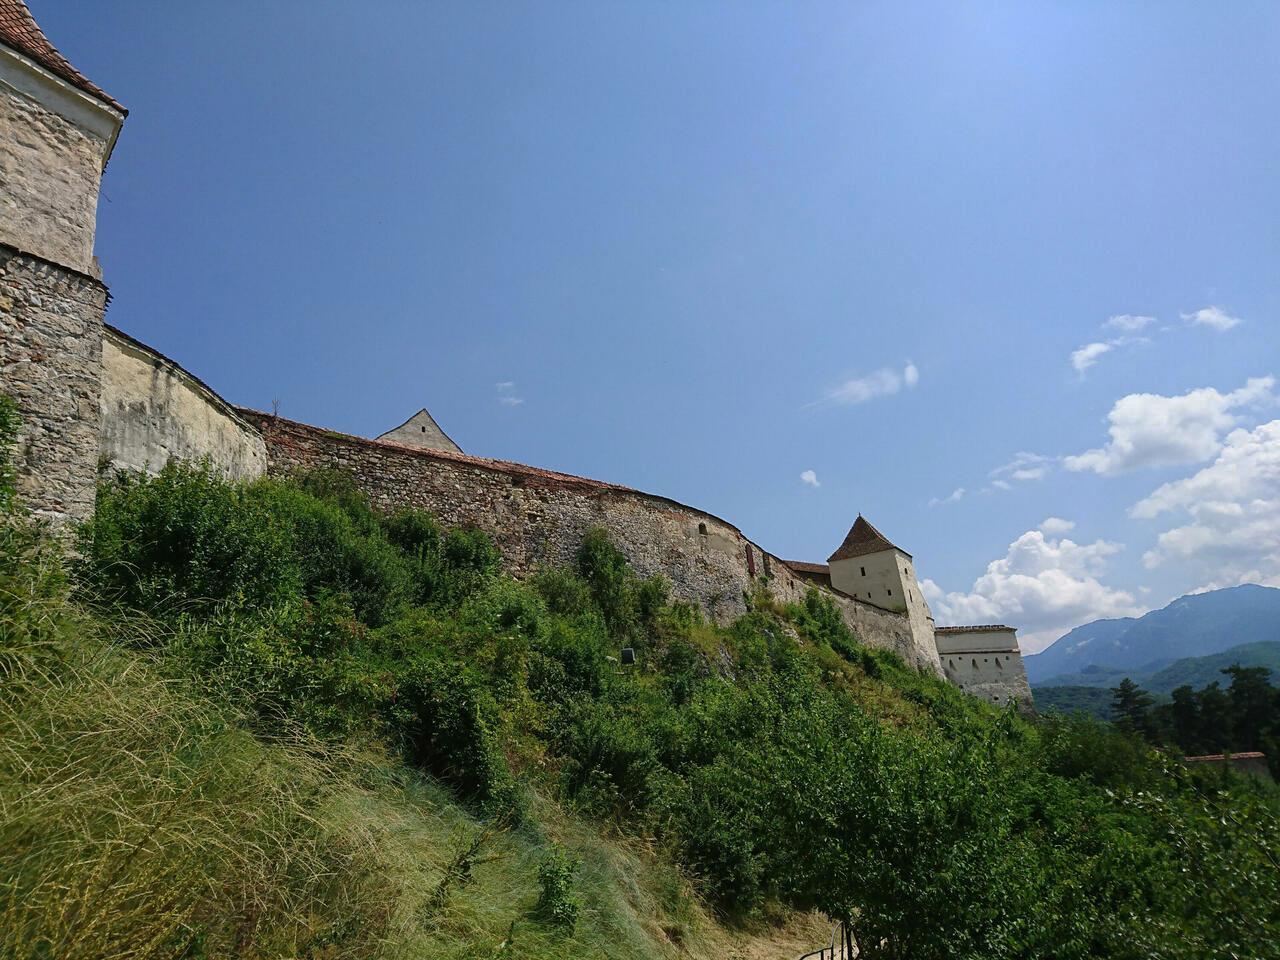 Bauernburg Rosenau, Brasov;Rumänien